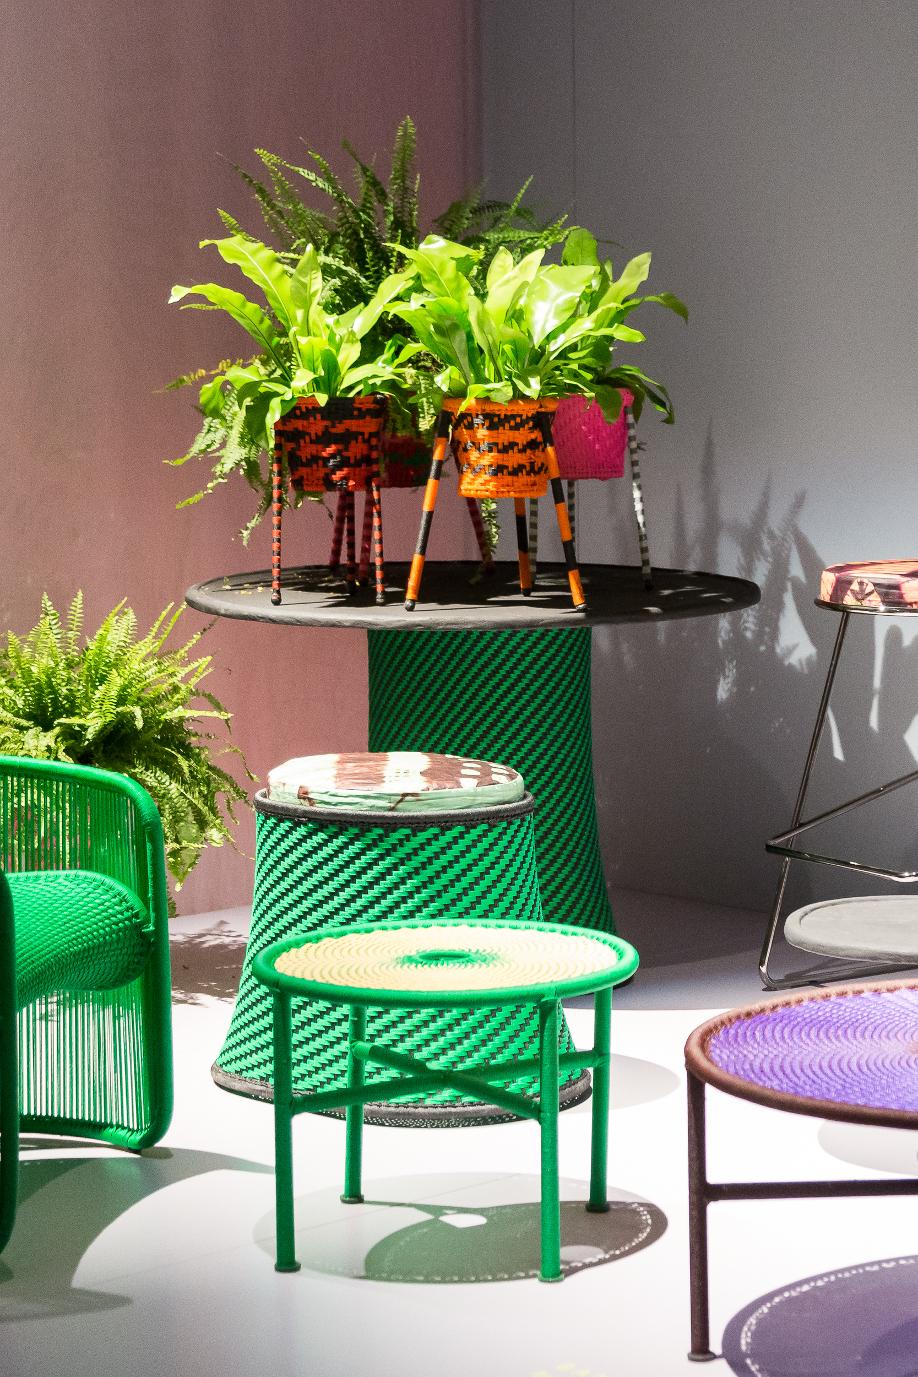 westwing-salone-del-mobile-pflanzentöpfe-grün